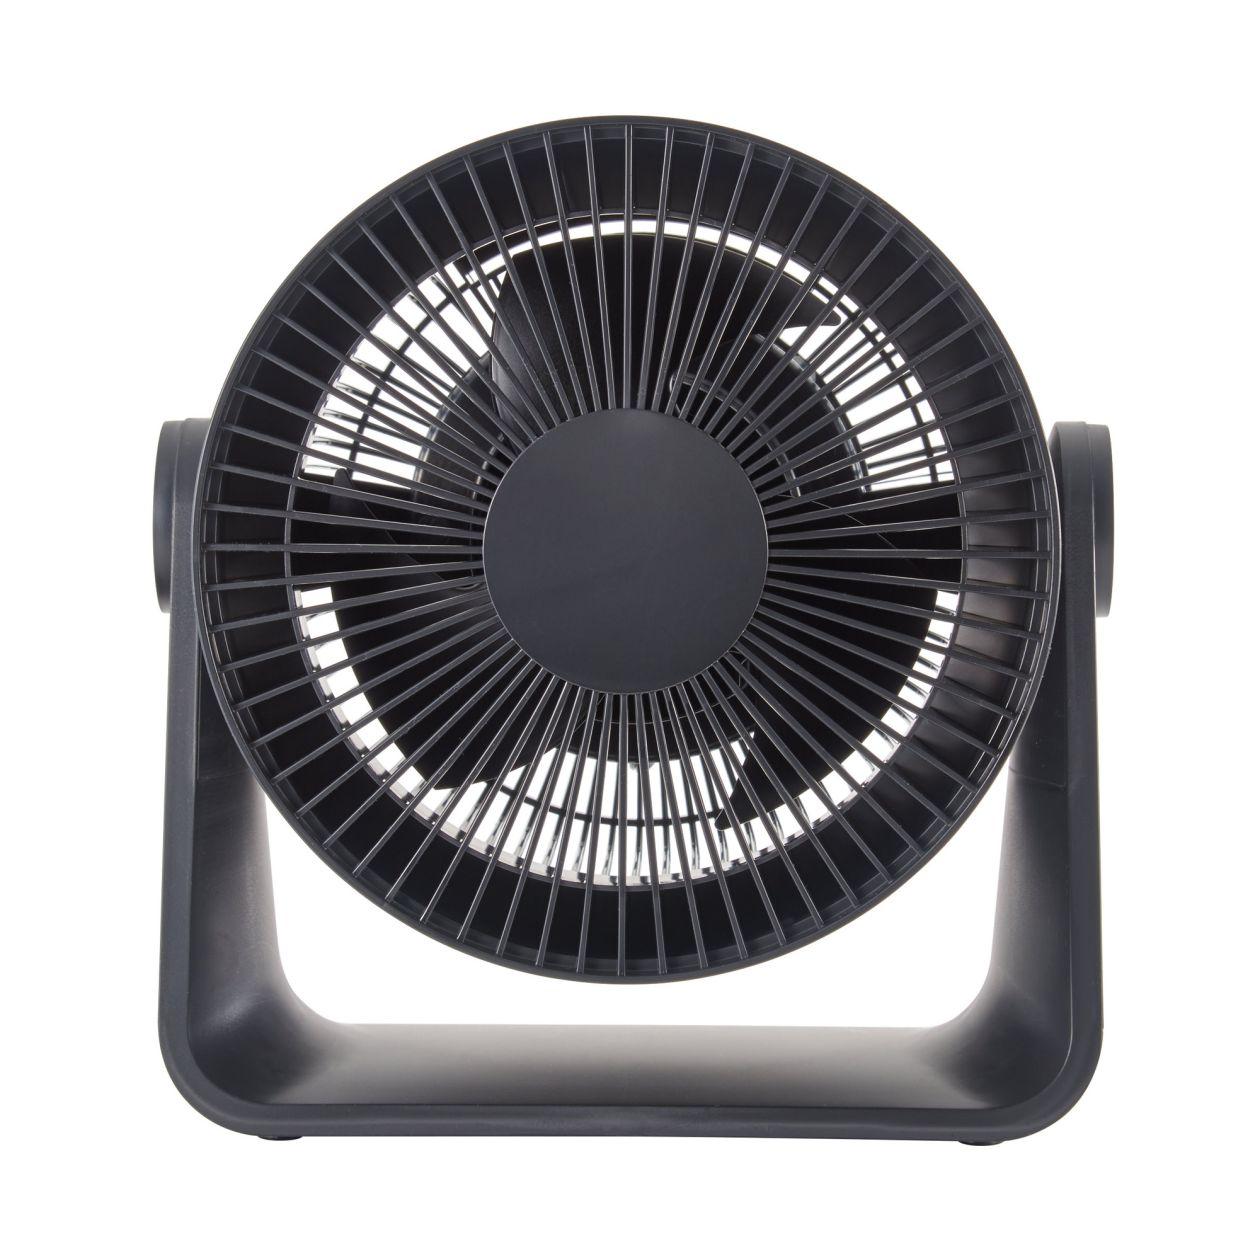 RoomClip商品情報 - サーキュレーター(低騒音ファン)・ホワイト ブラック